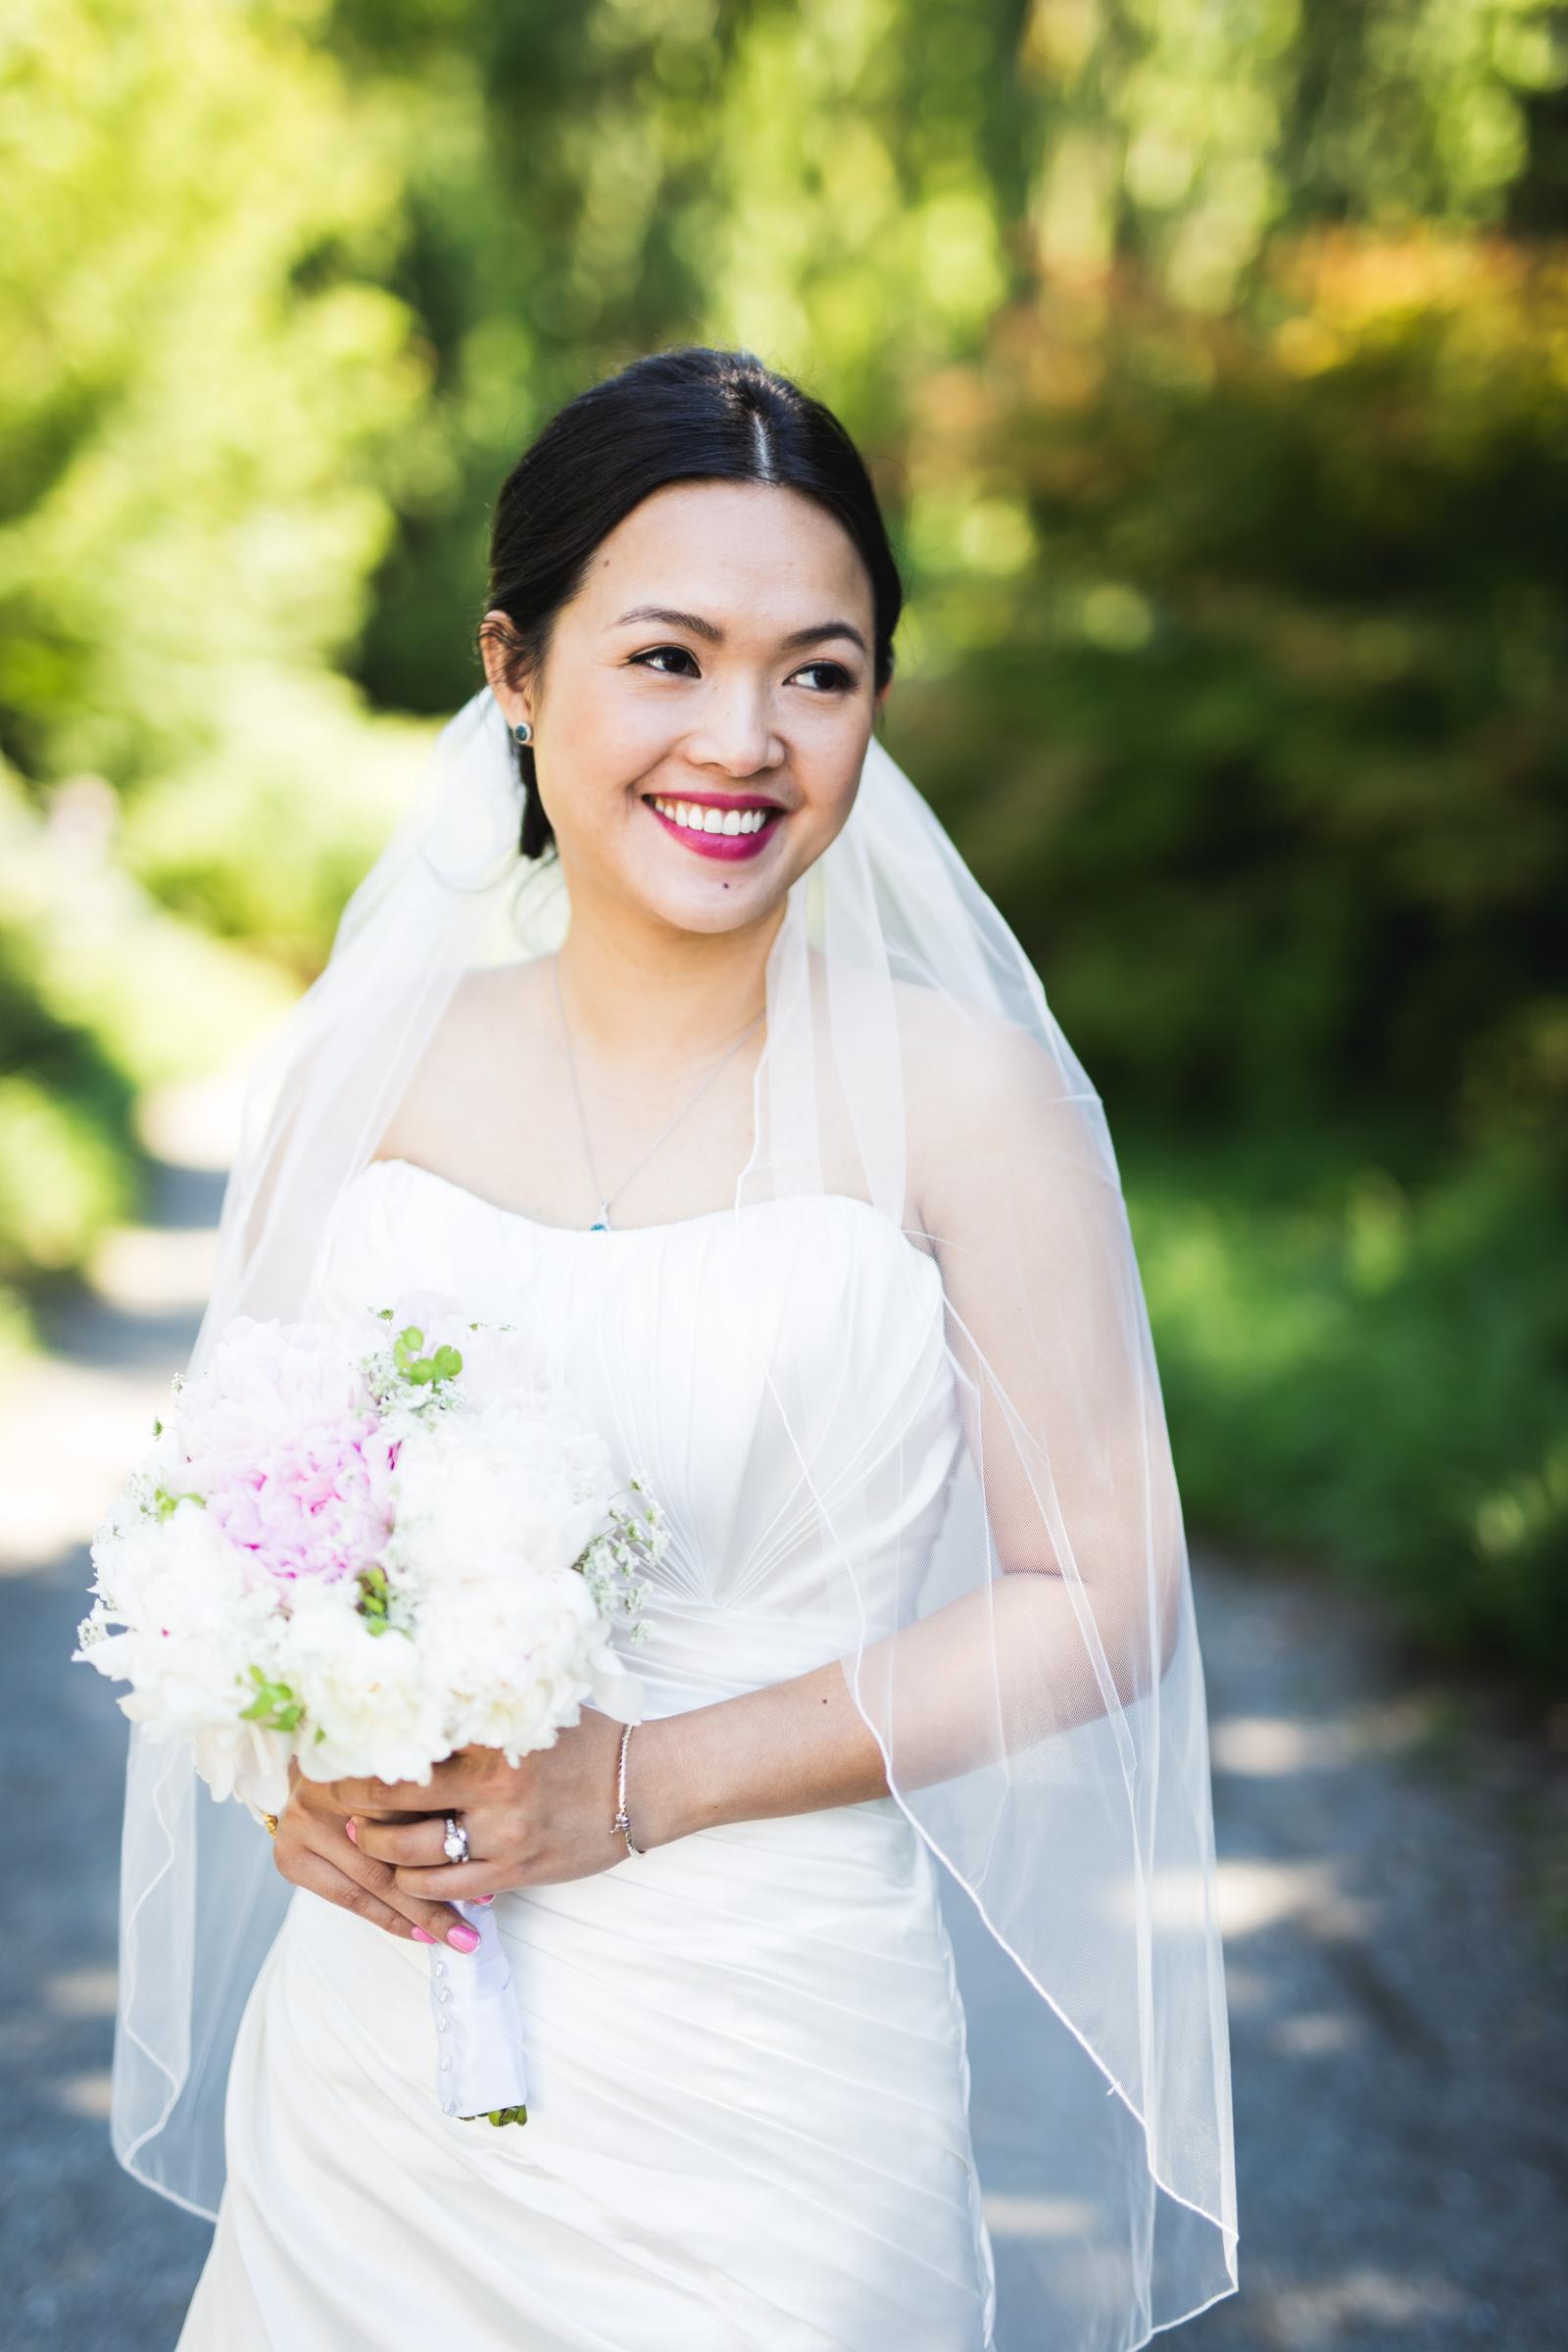 NancyVu-Renton-Wedding-062516-0382.jpg